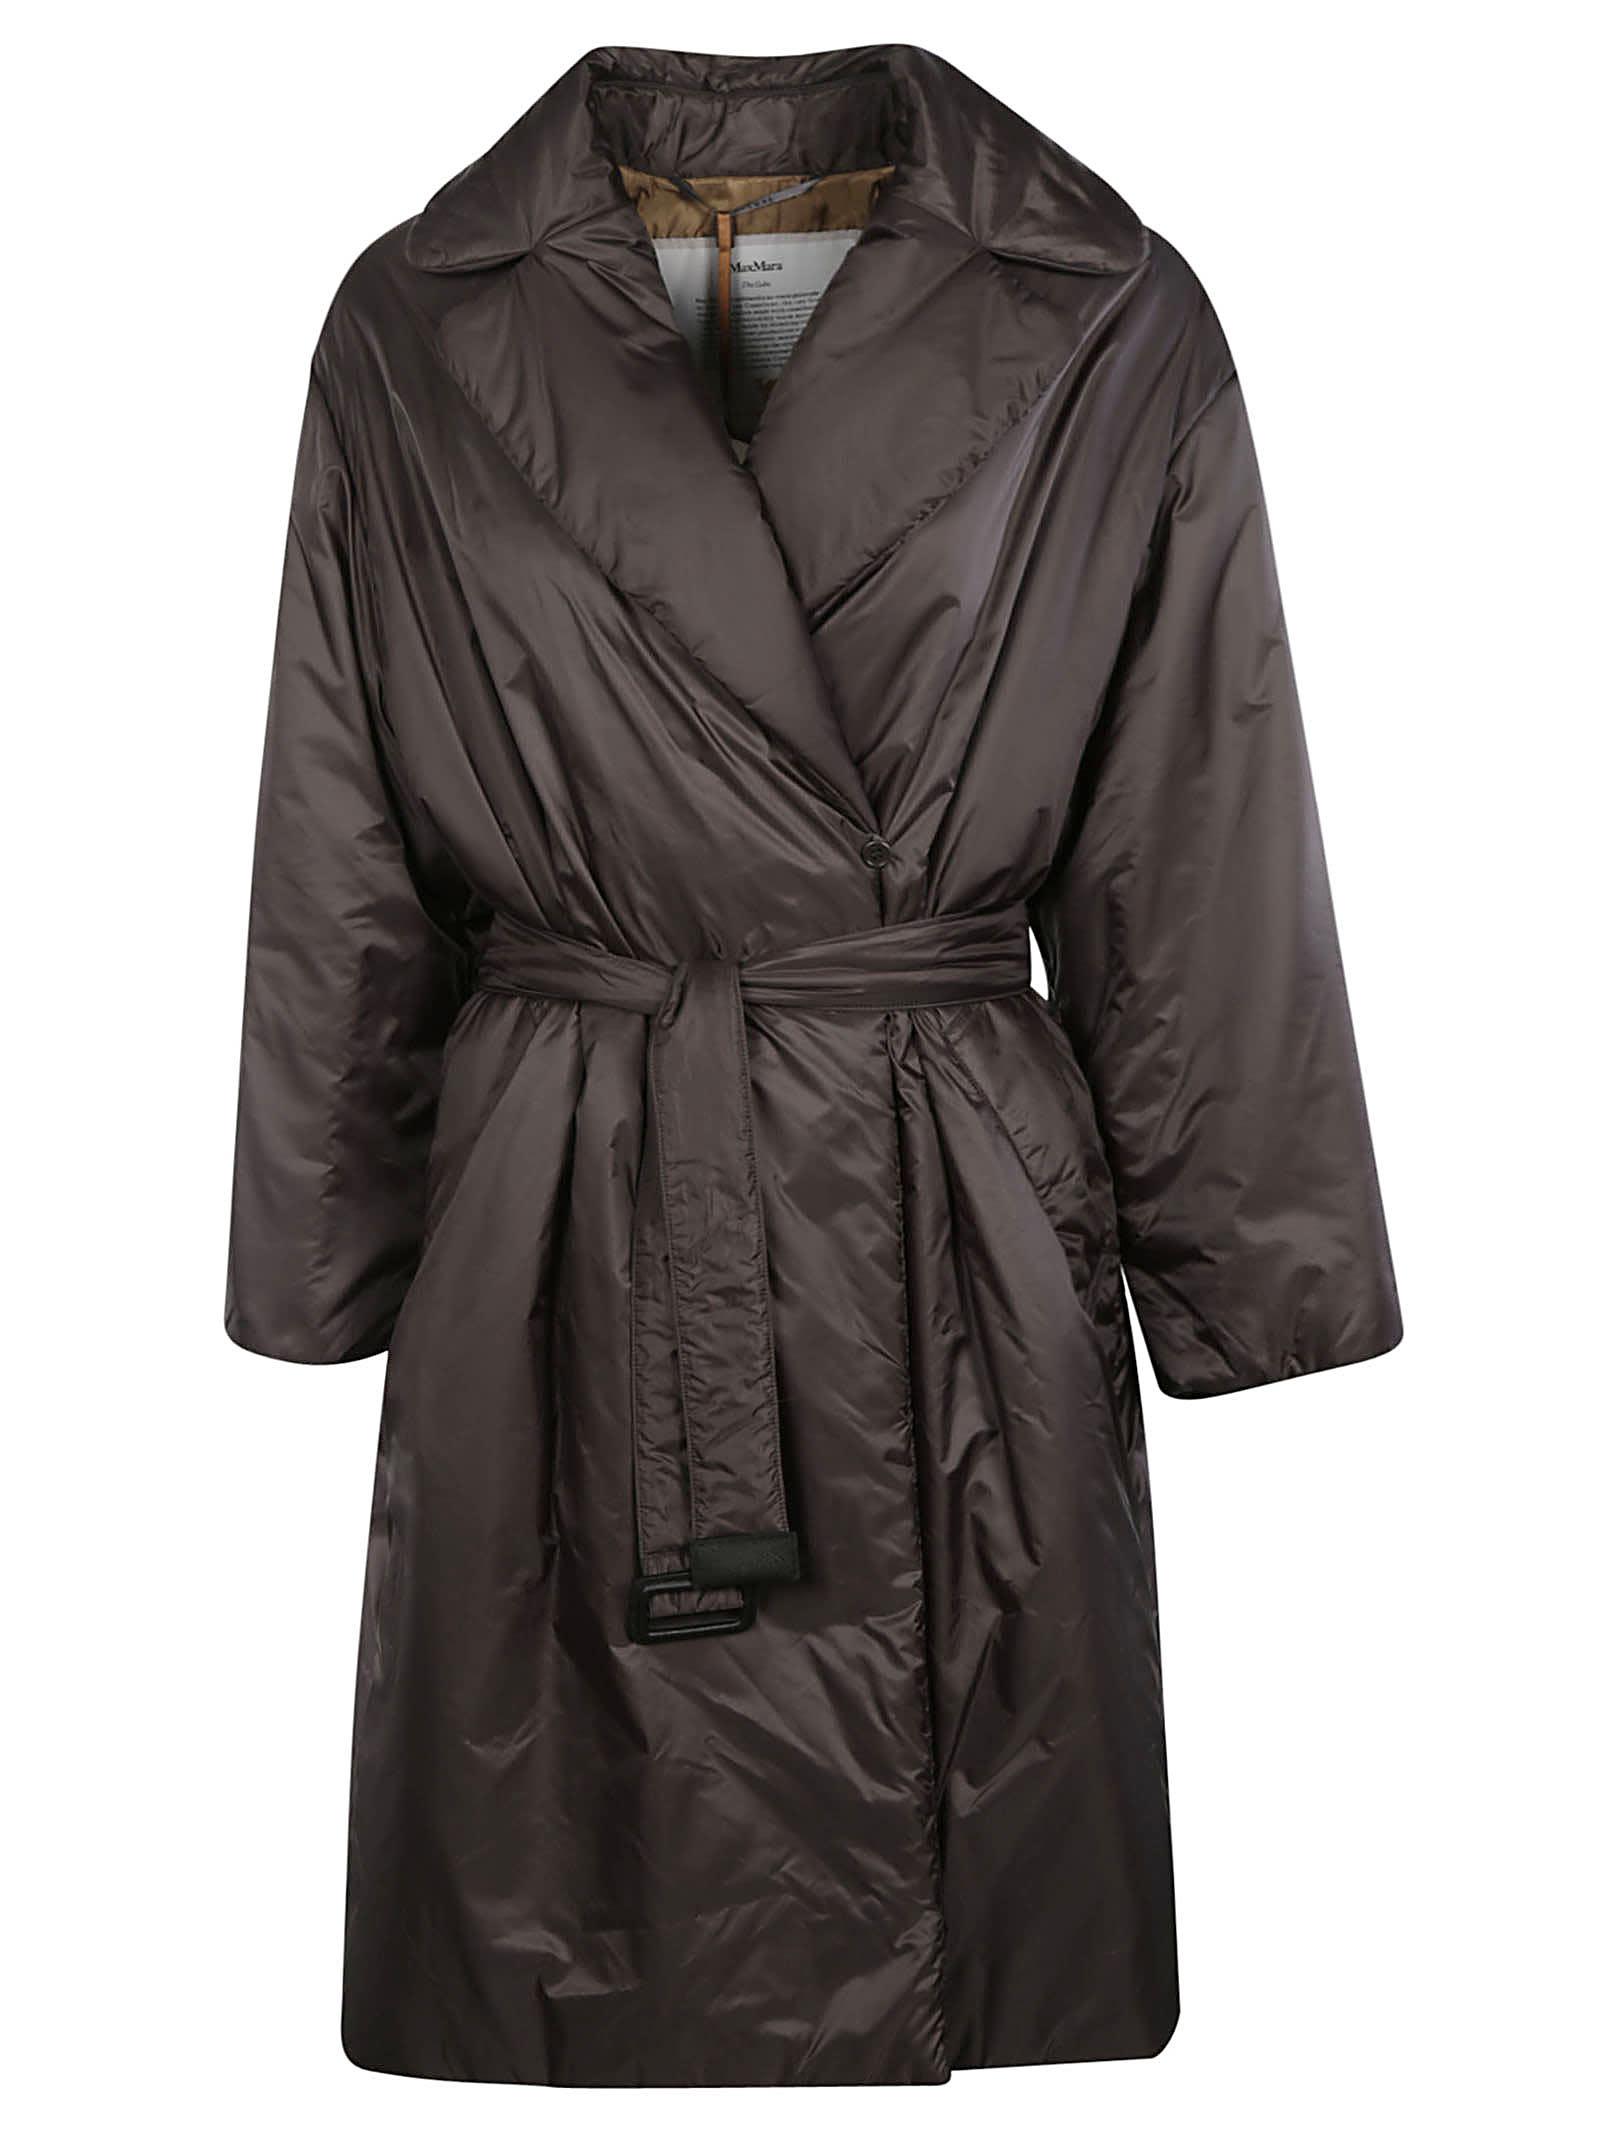 Greenco Coat